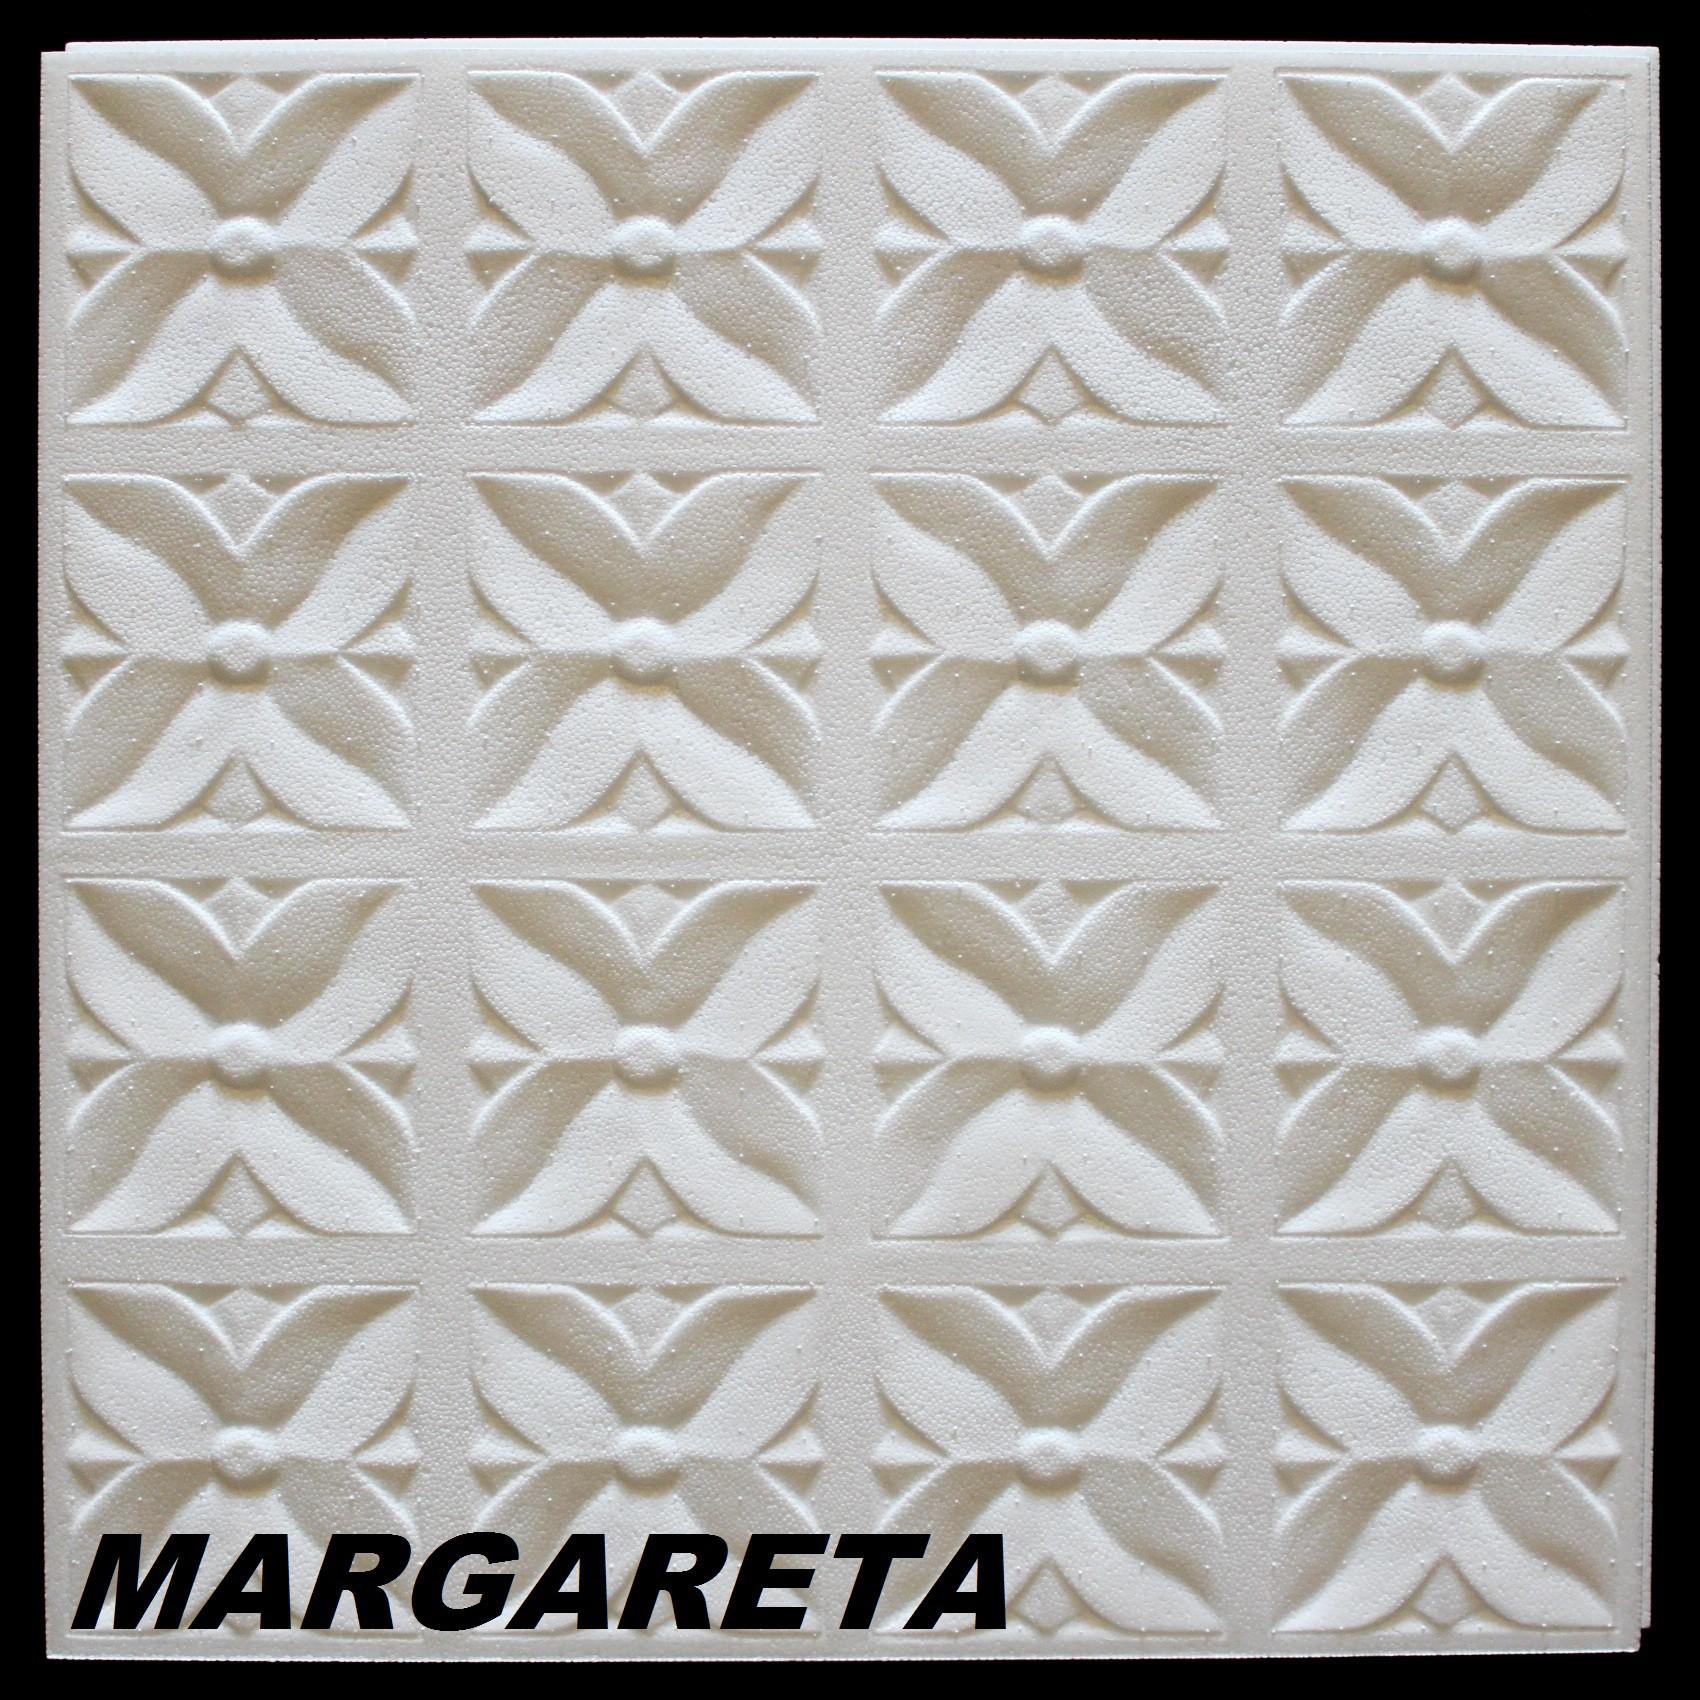 1 M2 Deckenplatten Styroporplatten Stuck Decke Dekor Platten 50x50cm,  MARGARETA